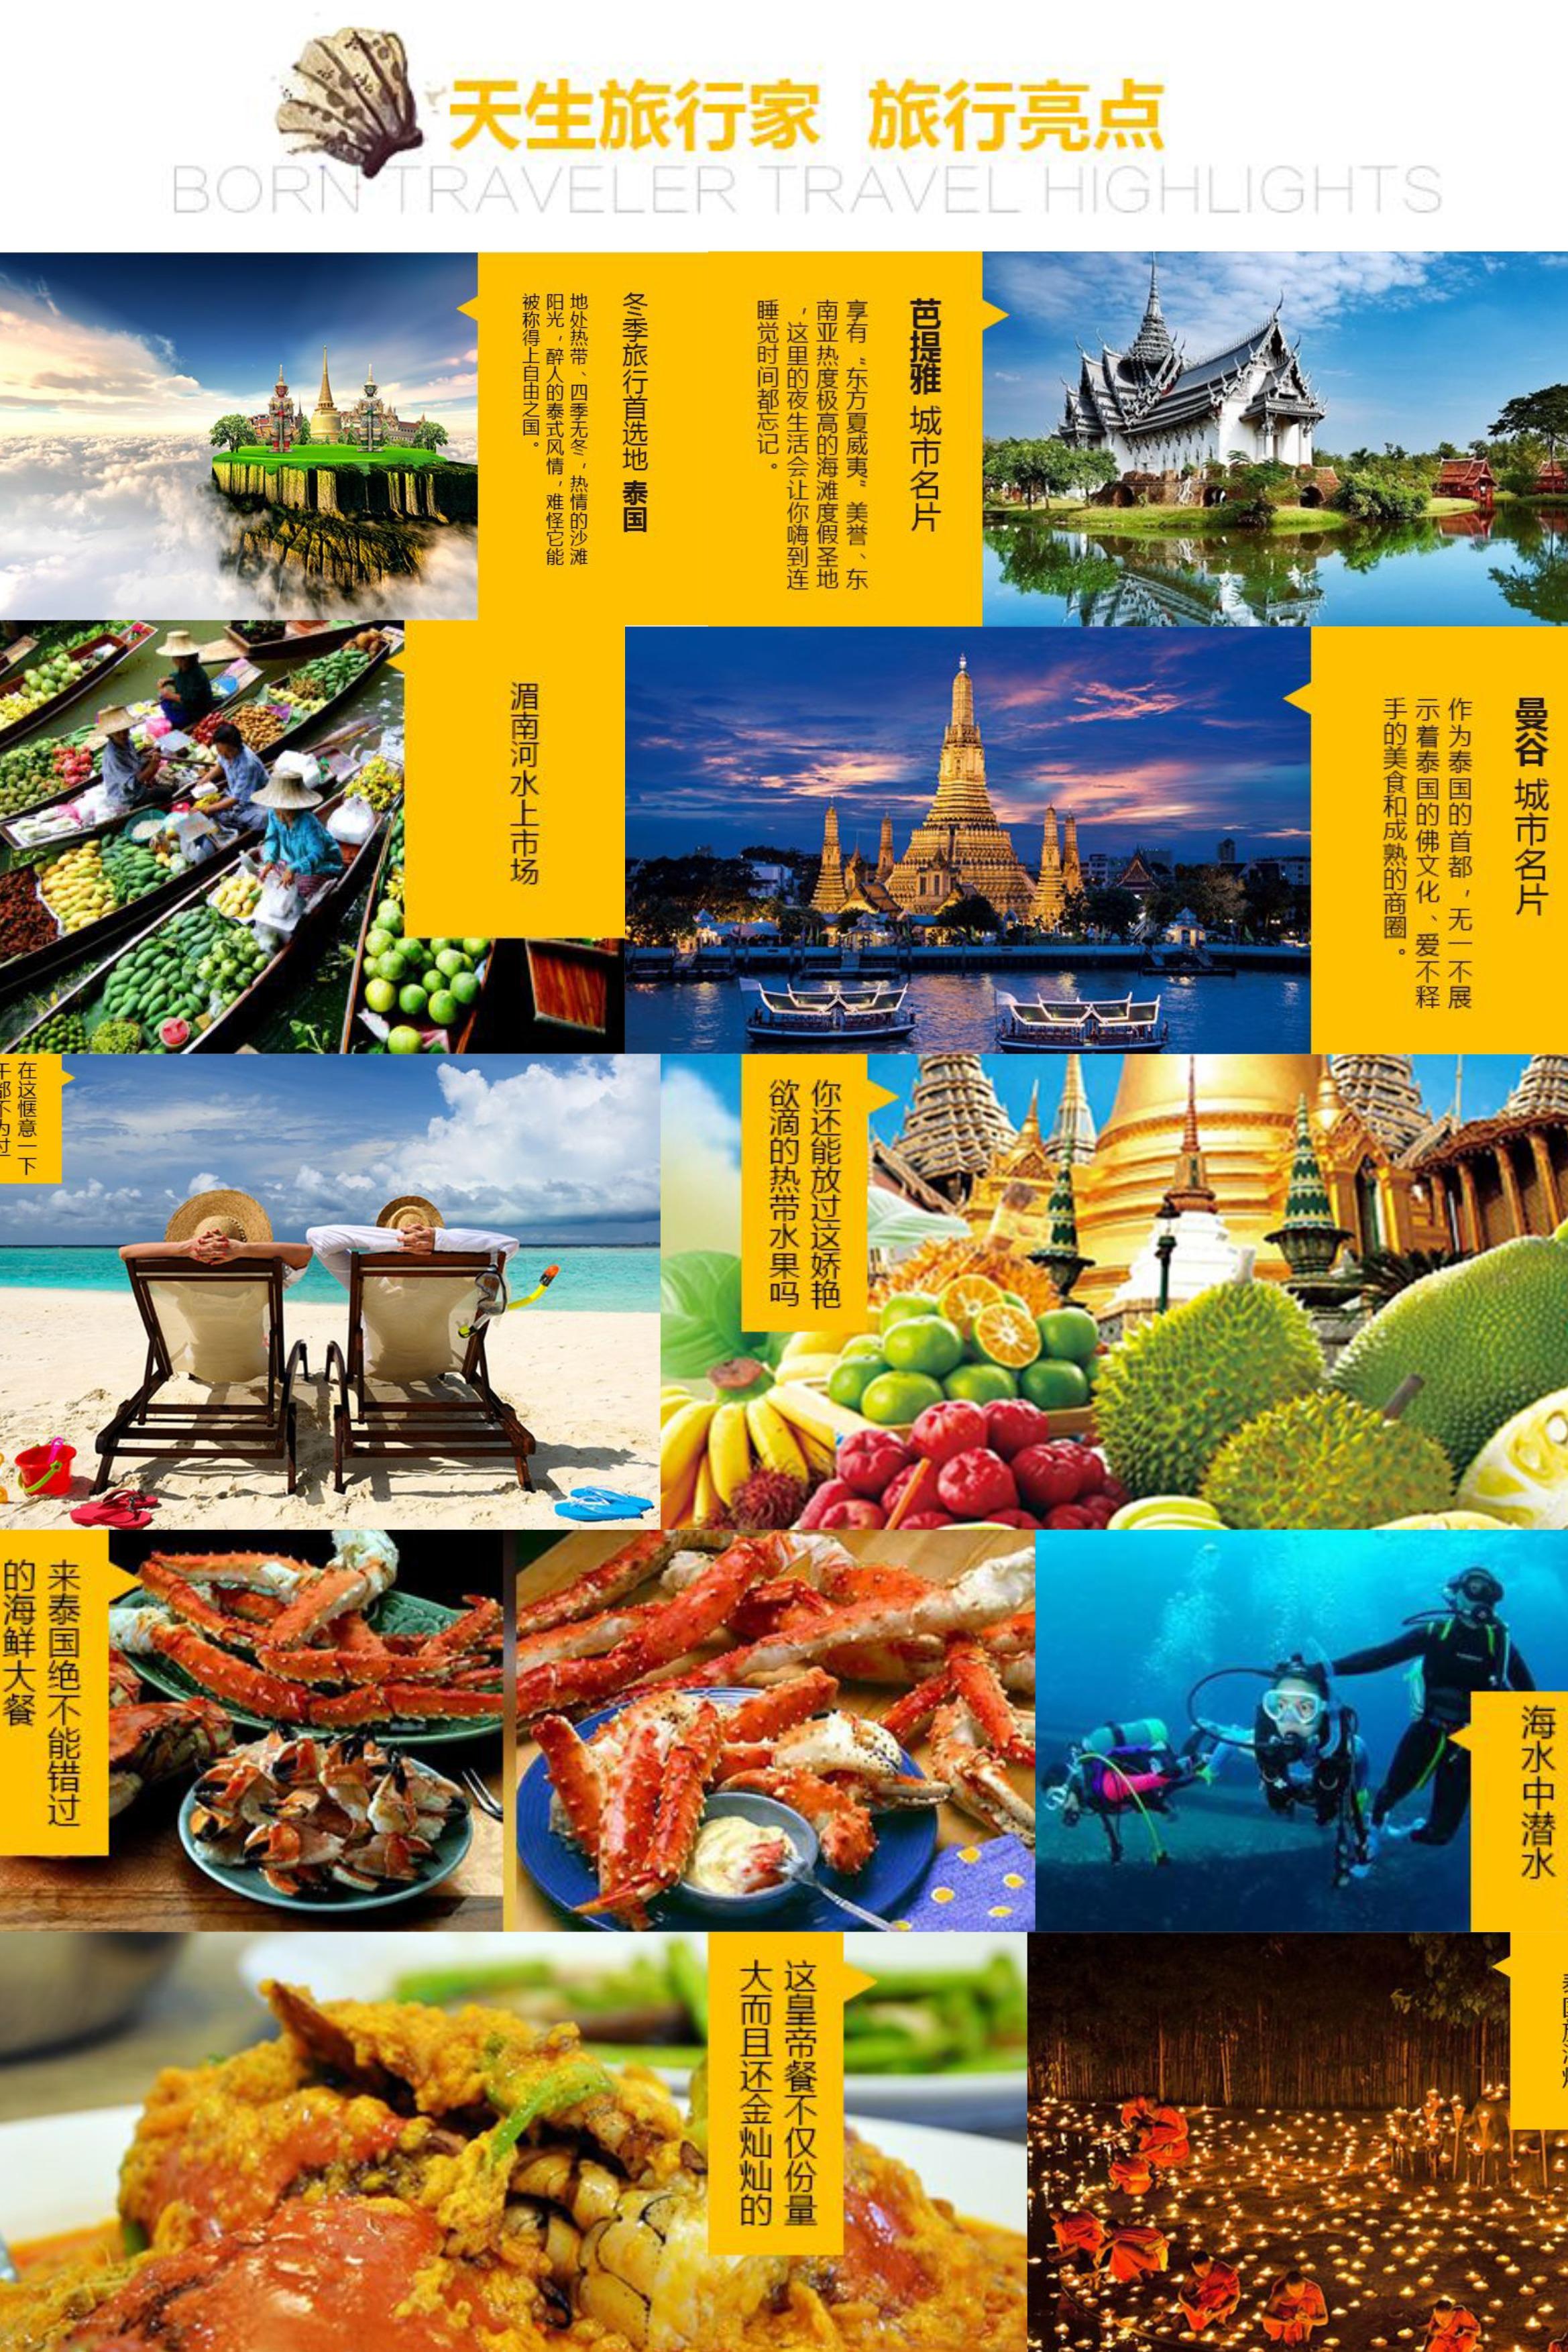 带上家人去泰国!带上家人去泰国!带上家人去泰国!